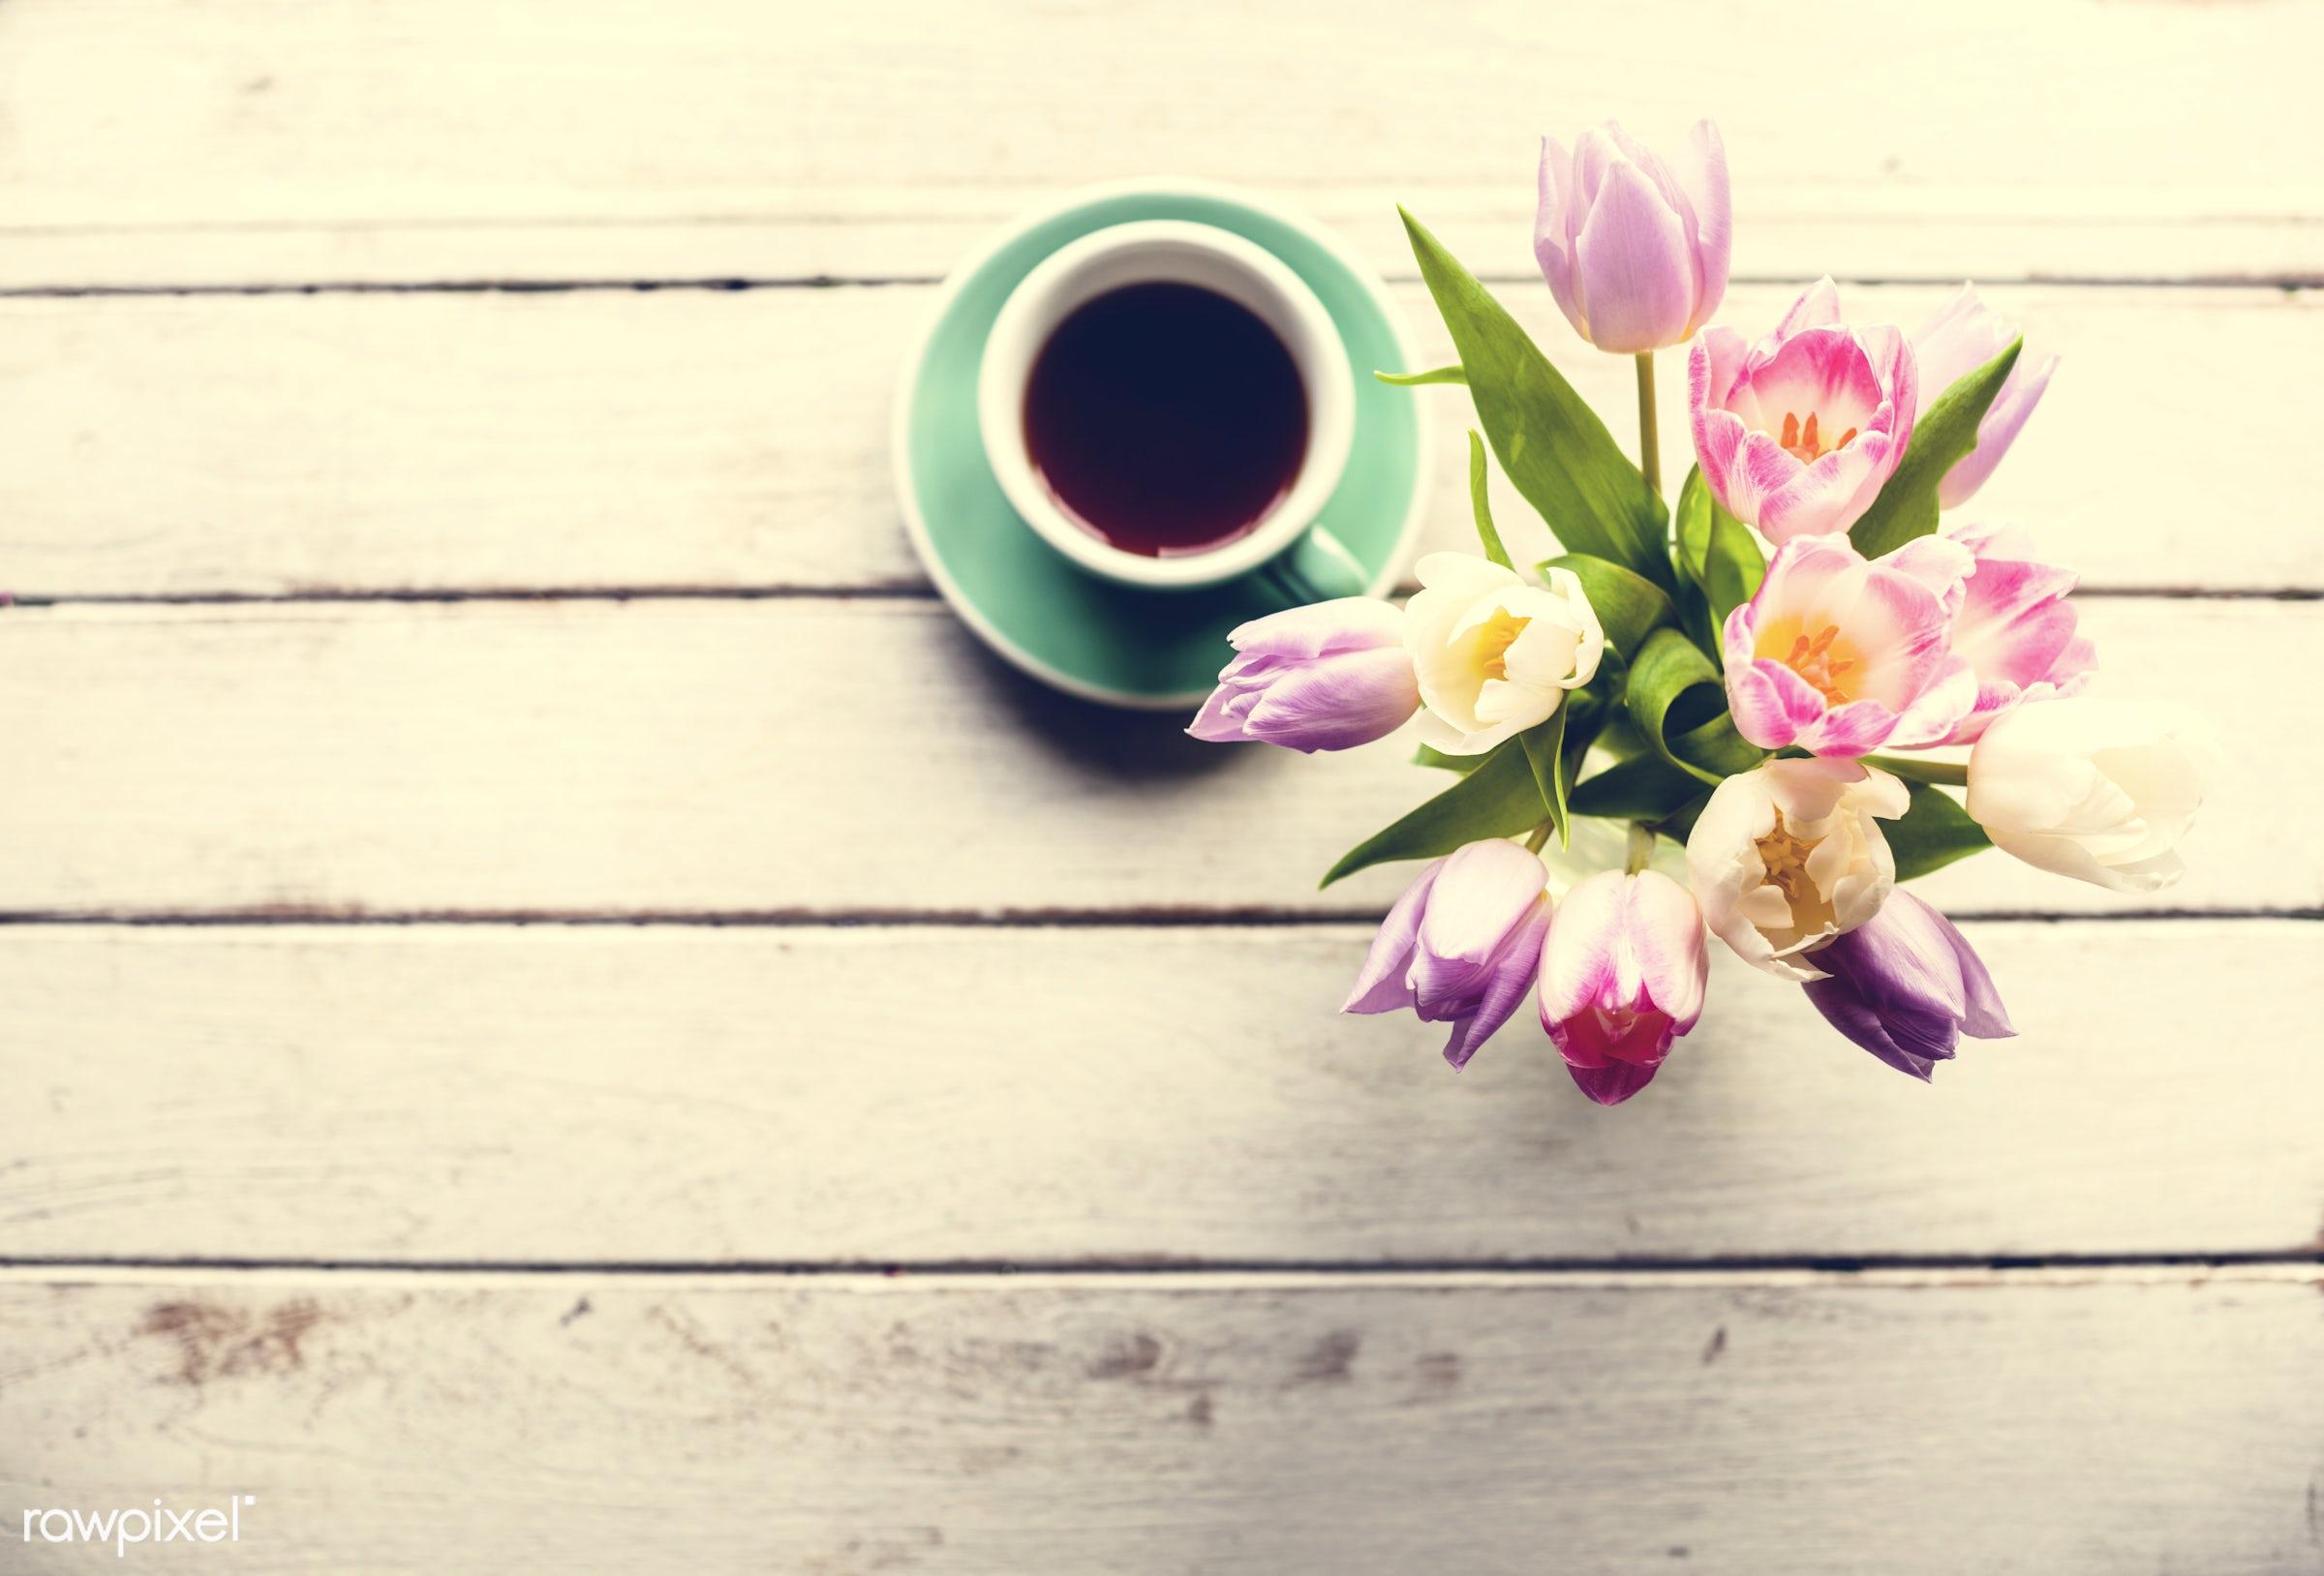 plant, bouquet, decorative, blossom, decor, fresh, drink, flowers, cheerful, flower, romance, decoration, flora, romantic,...